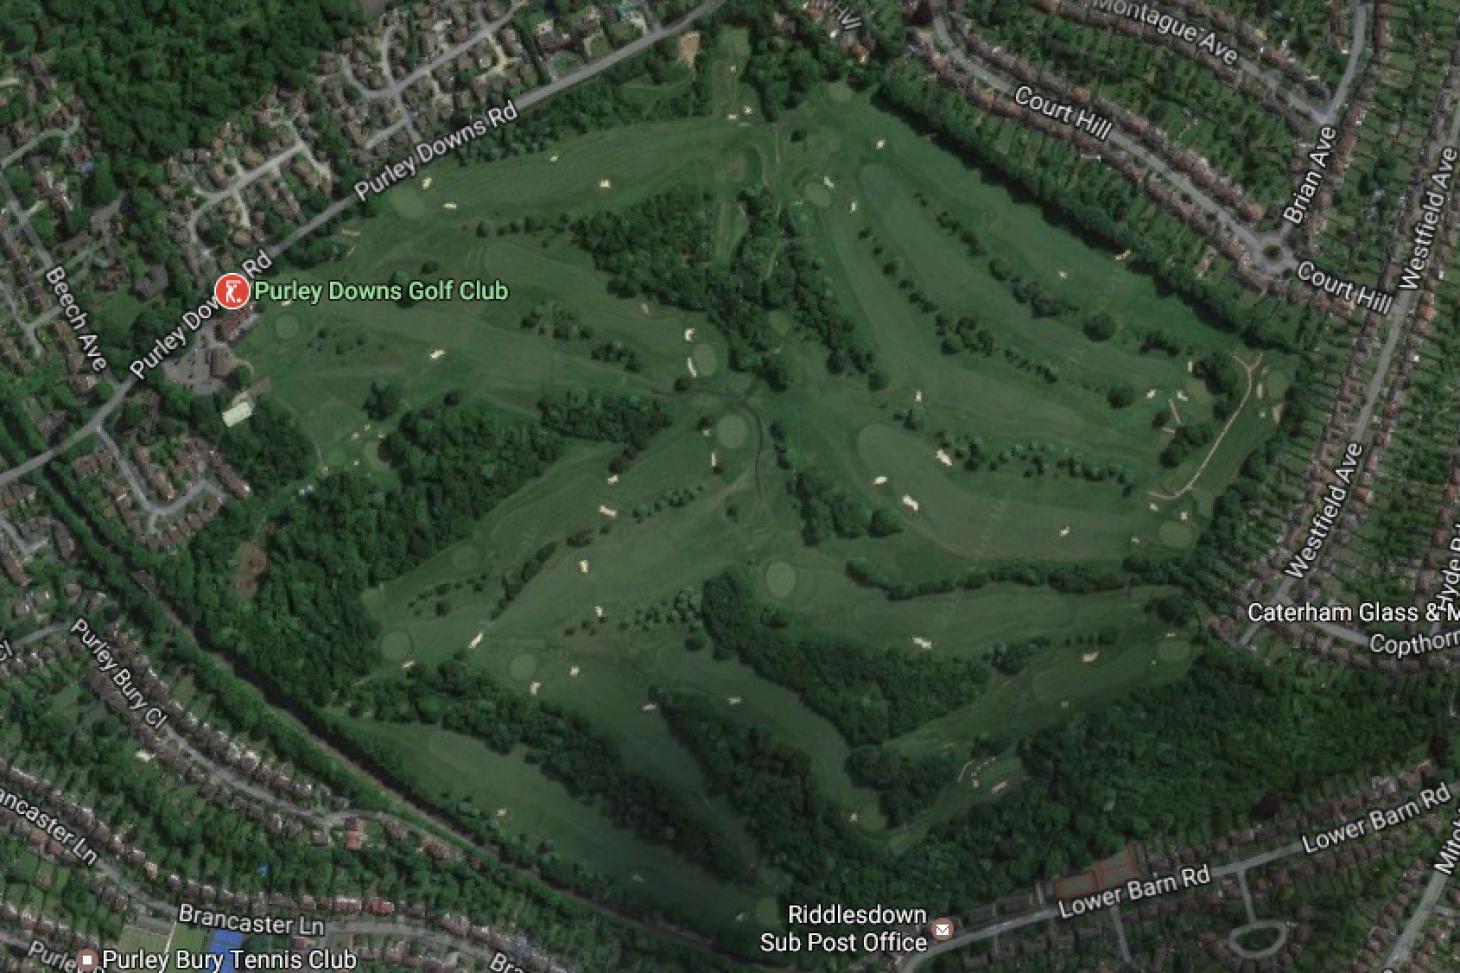 Purley Downs Golf Club 18 hole golf course